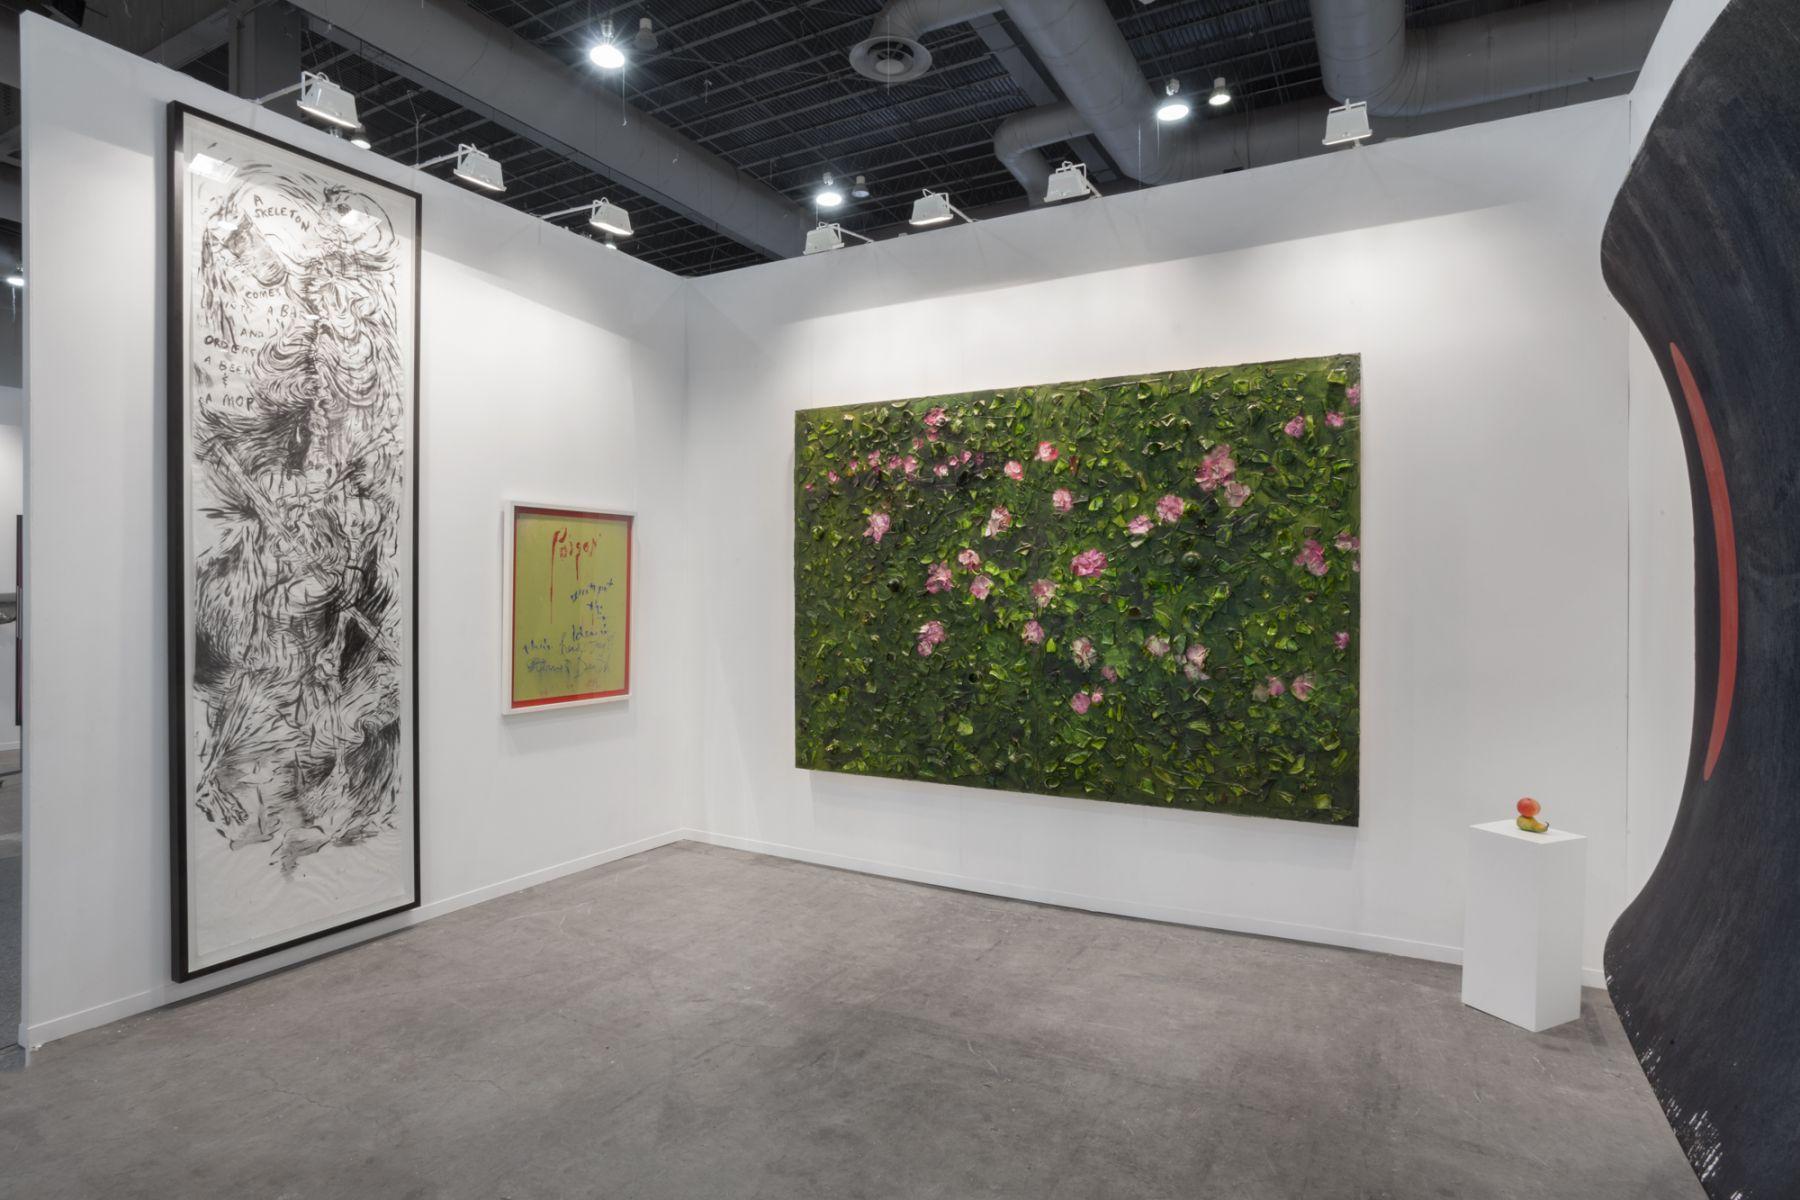 Installation view, Zona Maco, Mexico City, Vito Schnabel Gallery, St. Moritz,2018